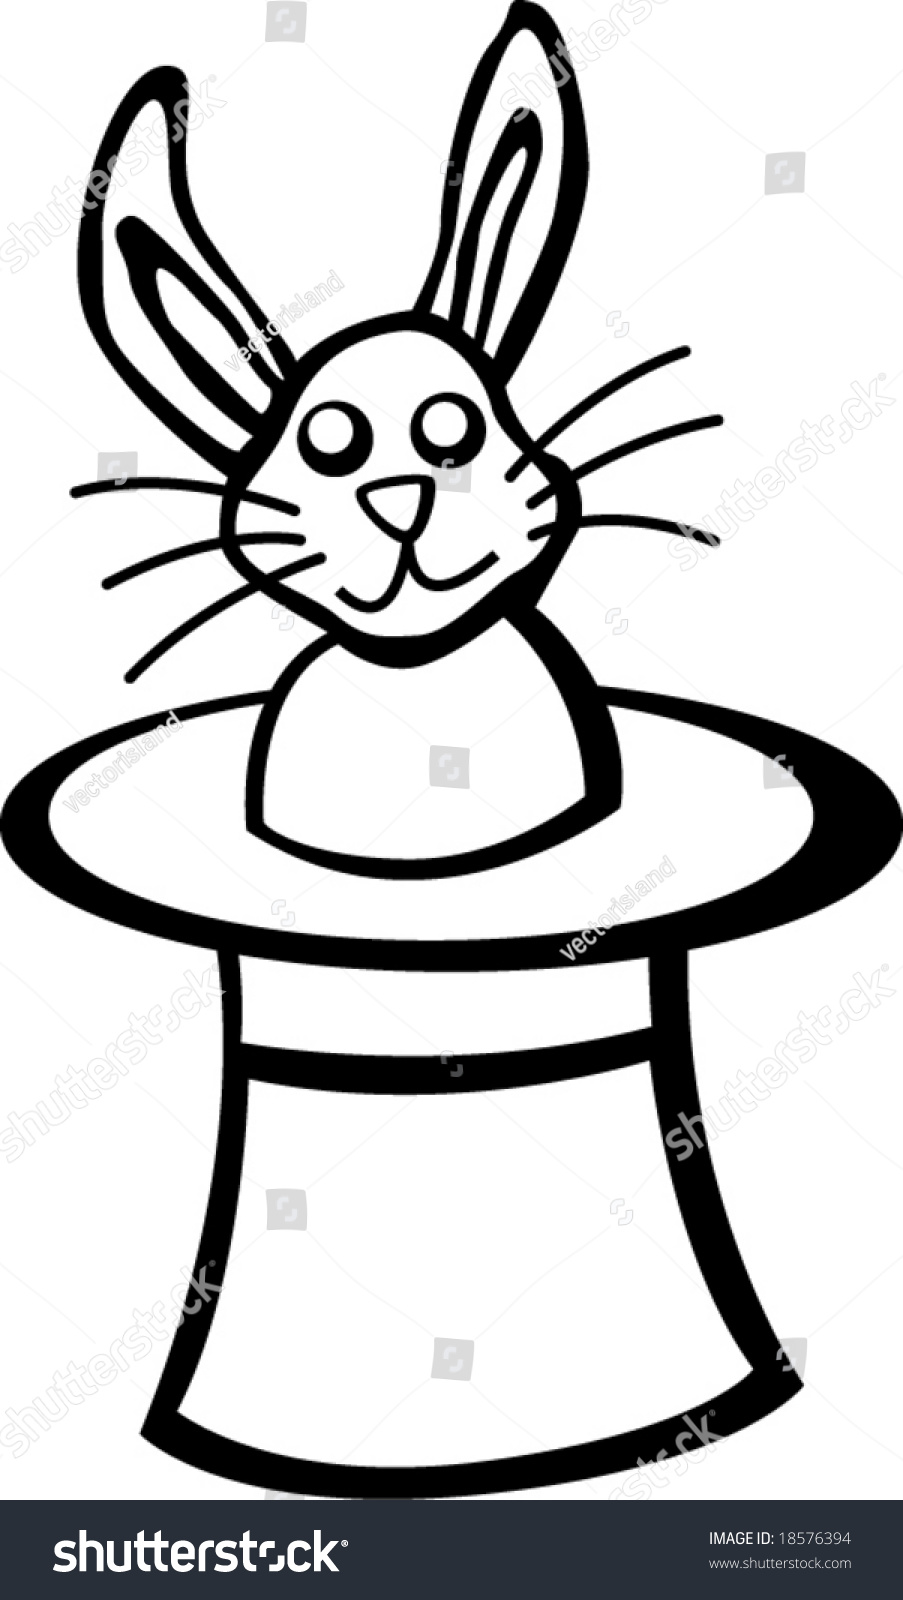 The magic coloring book trick - Rabbit In Hat Magic Trick